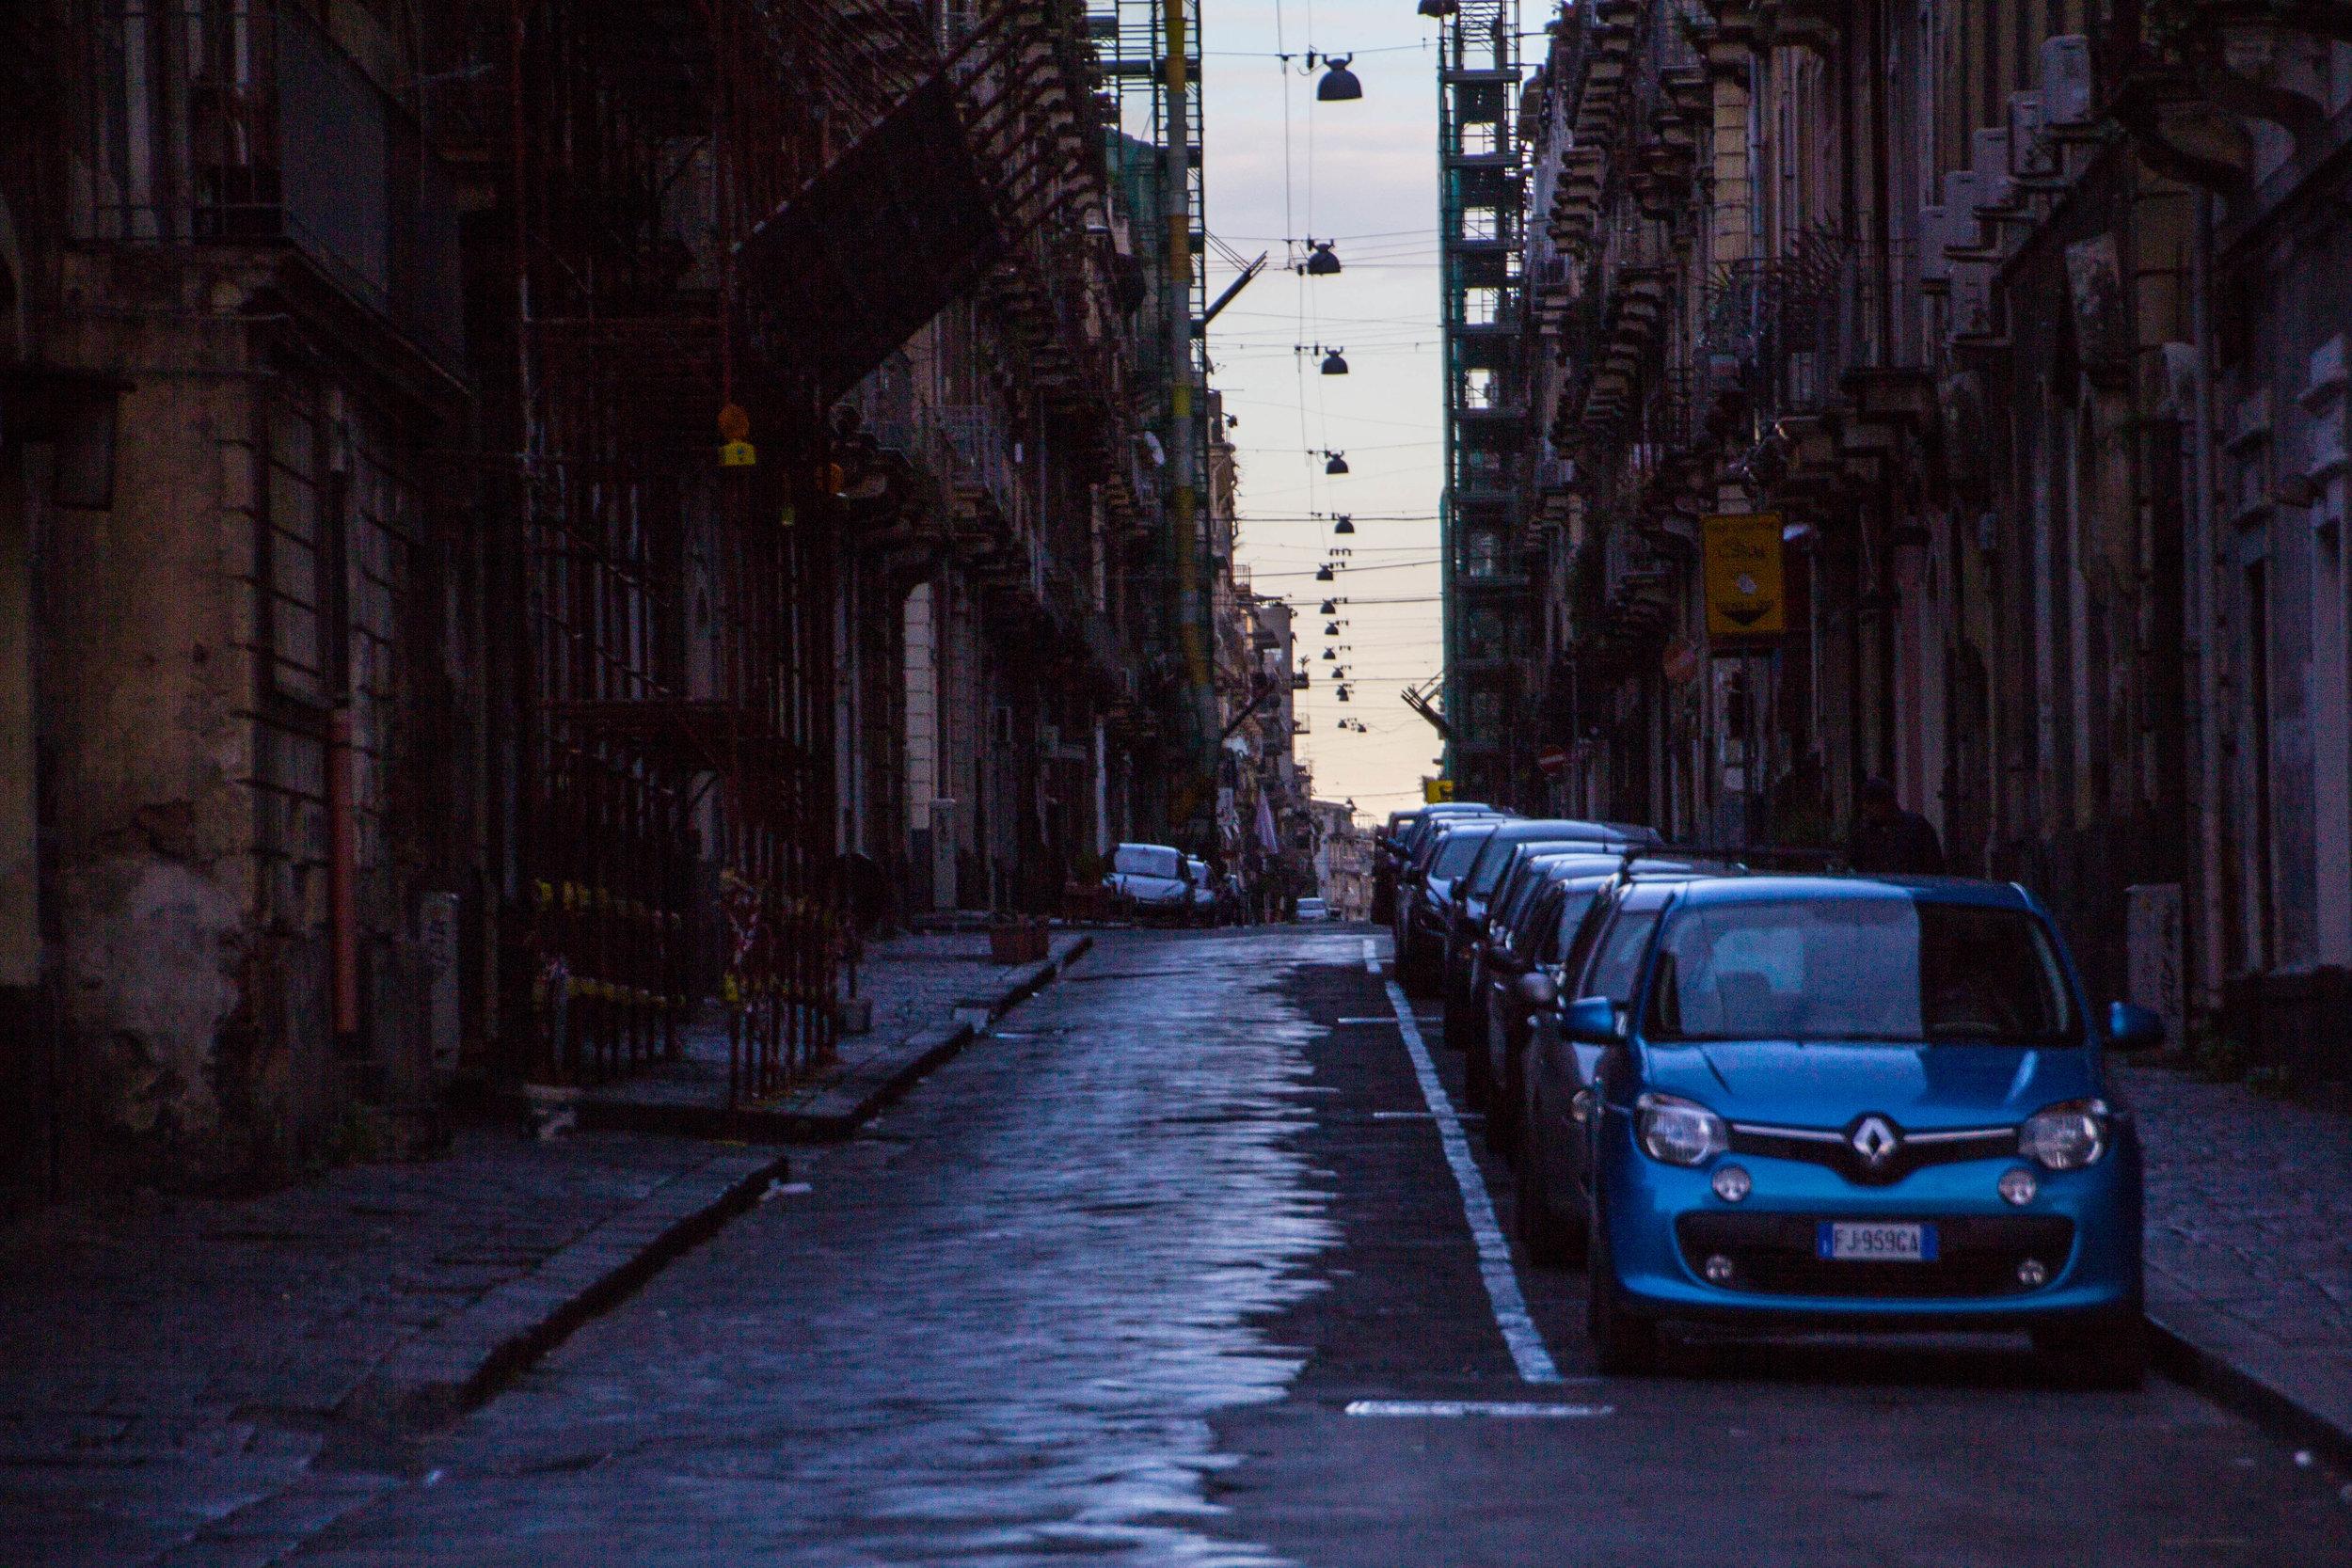 streets-catania-sicily-sicilia-4.jpg